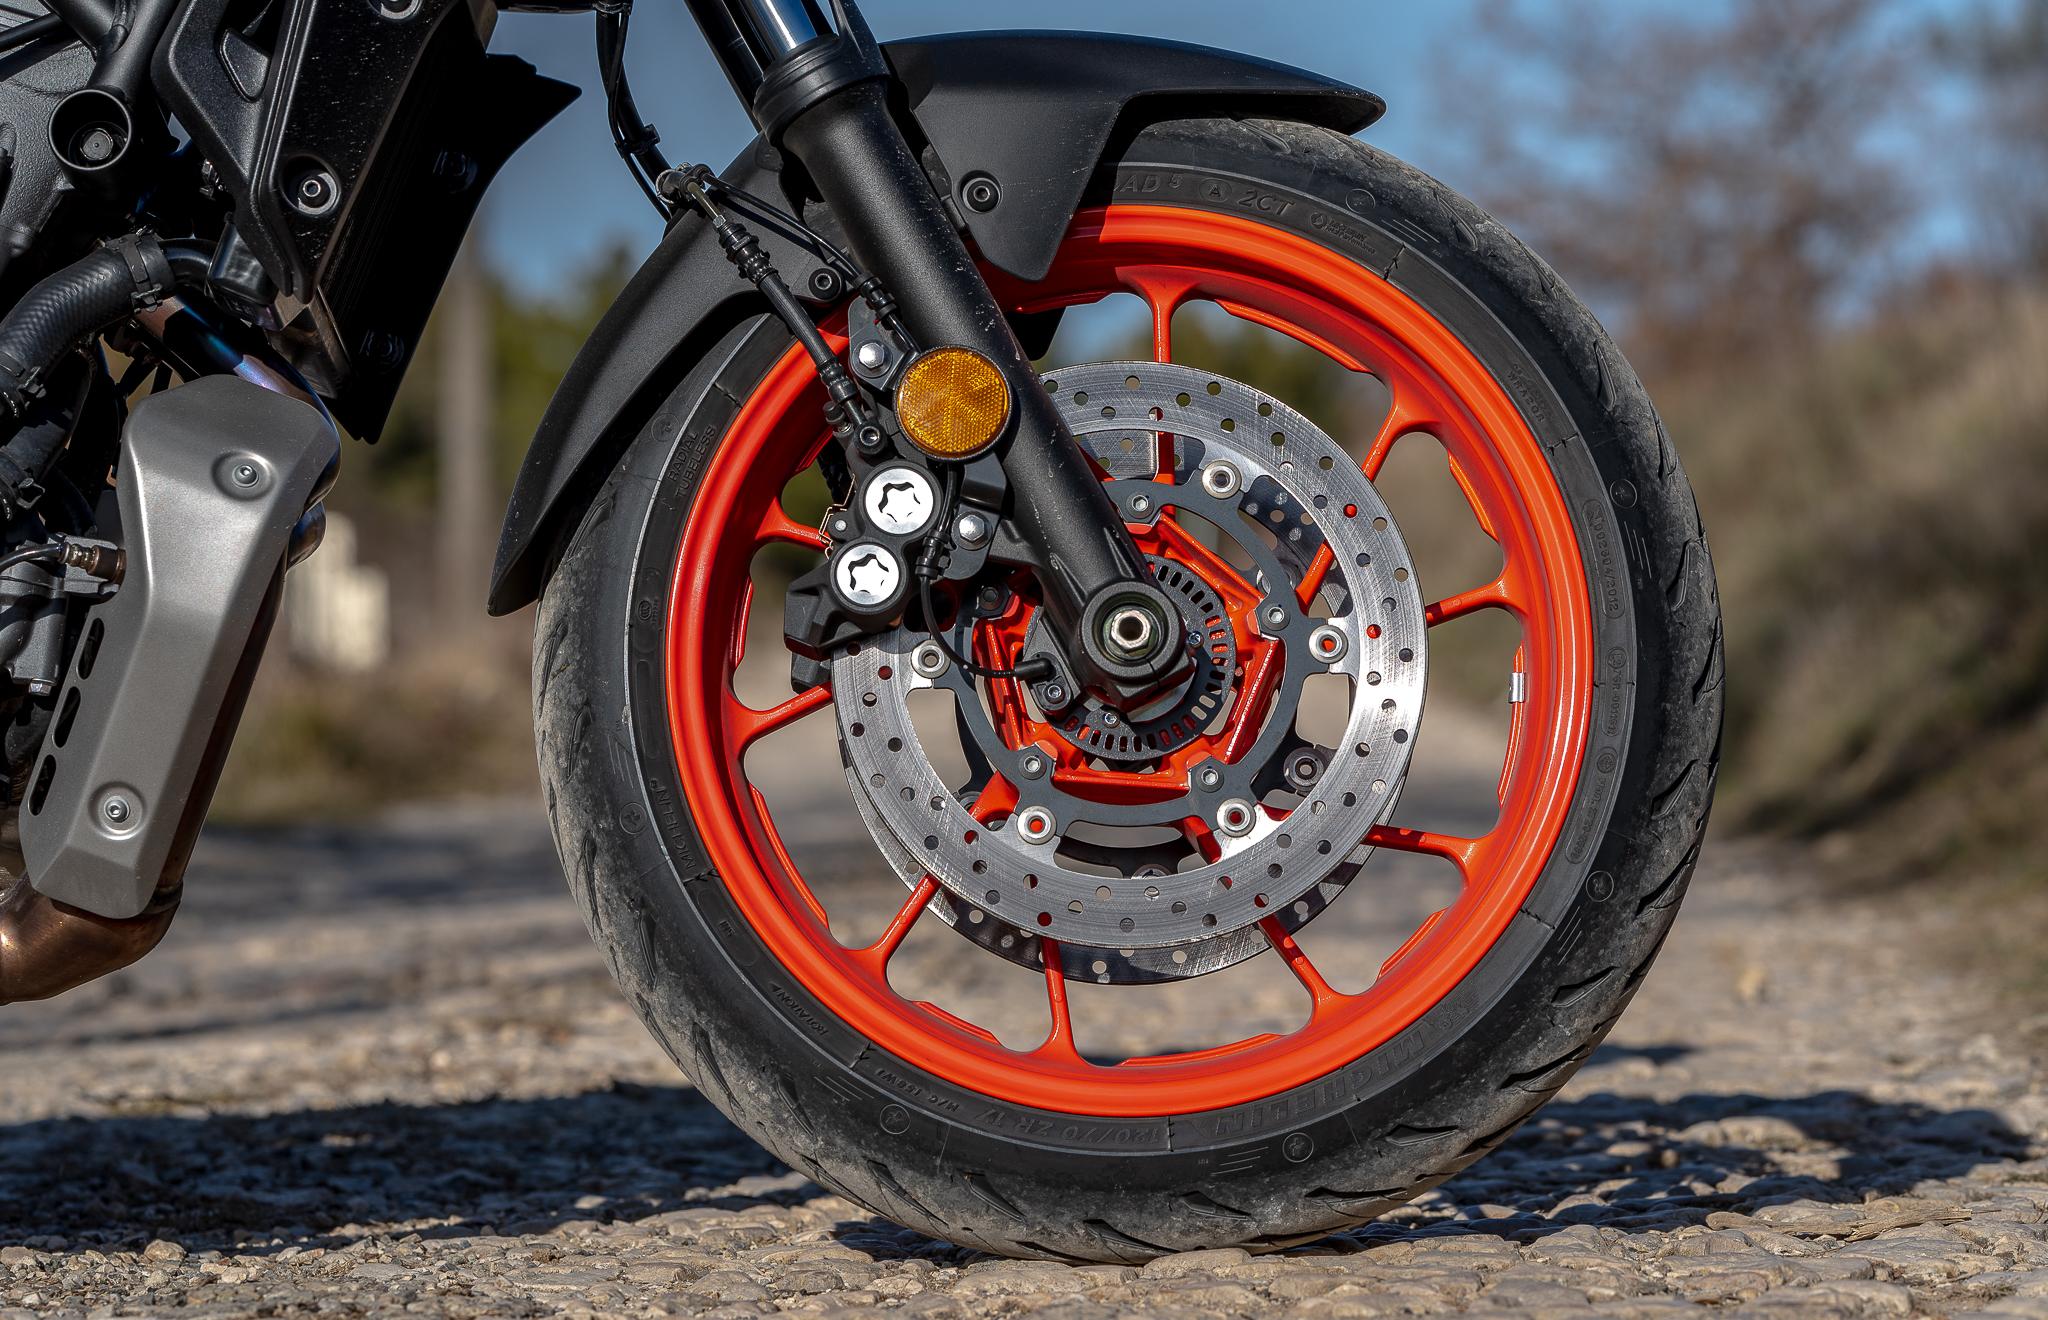 Yamaha freins